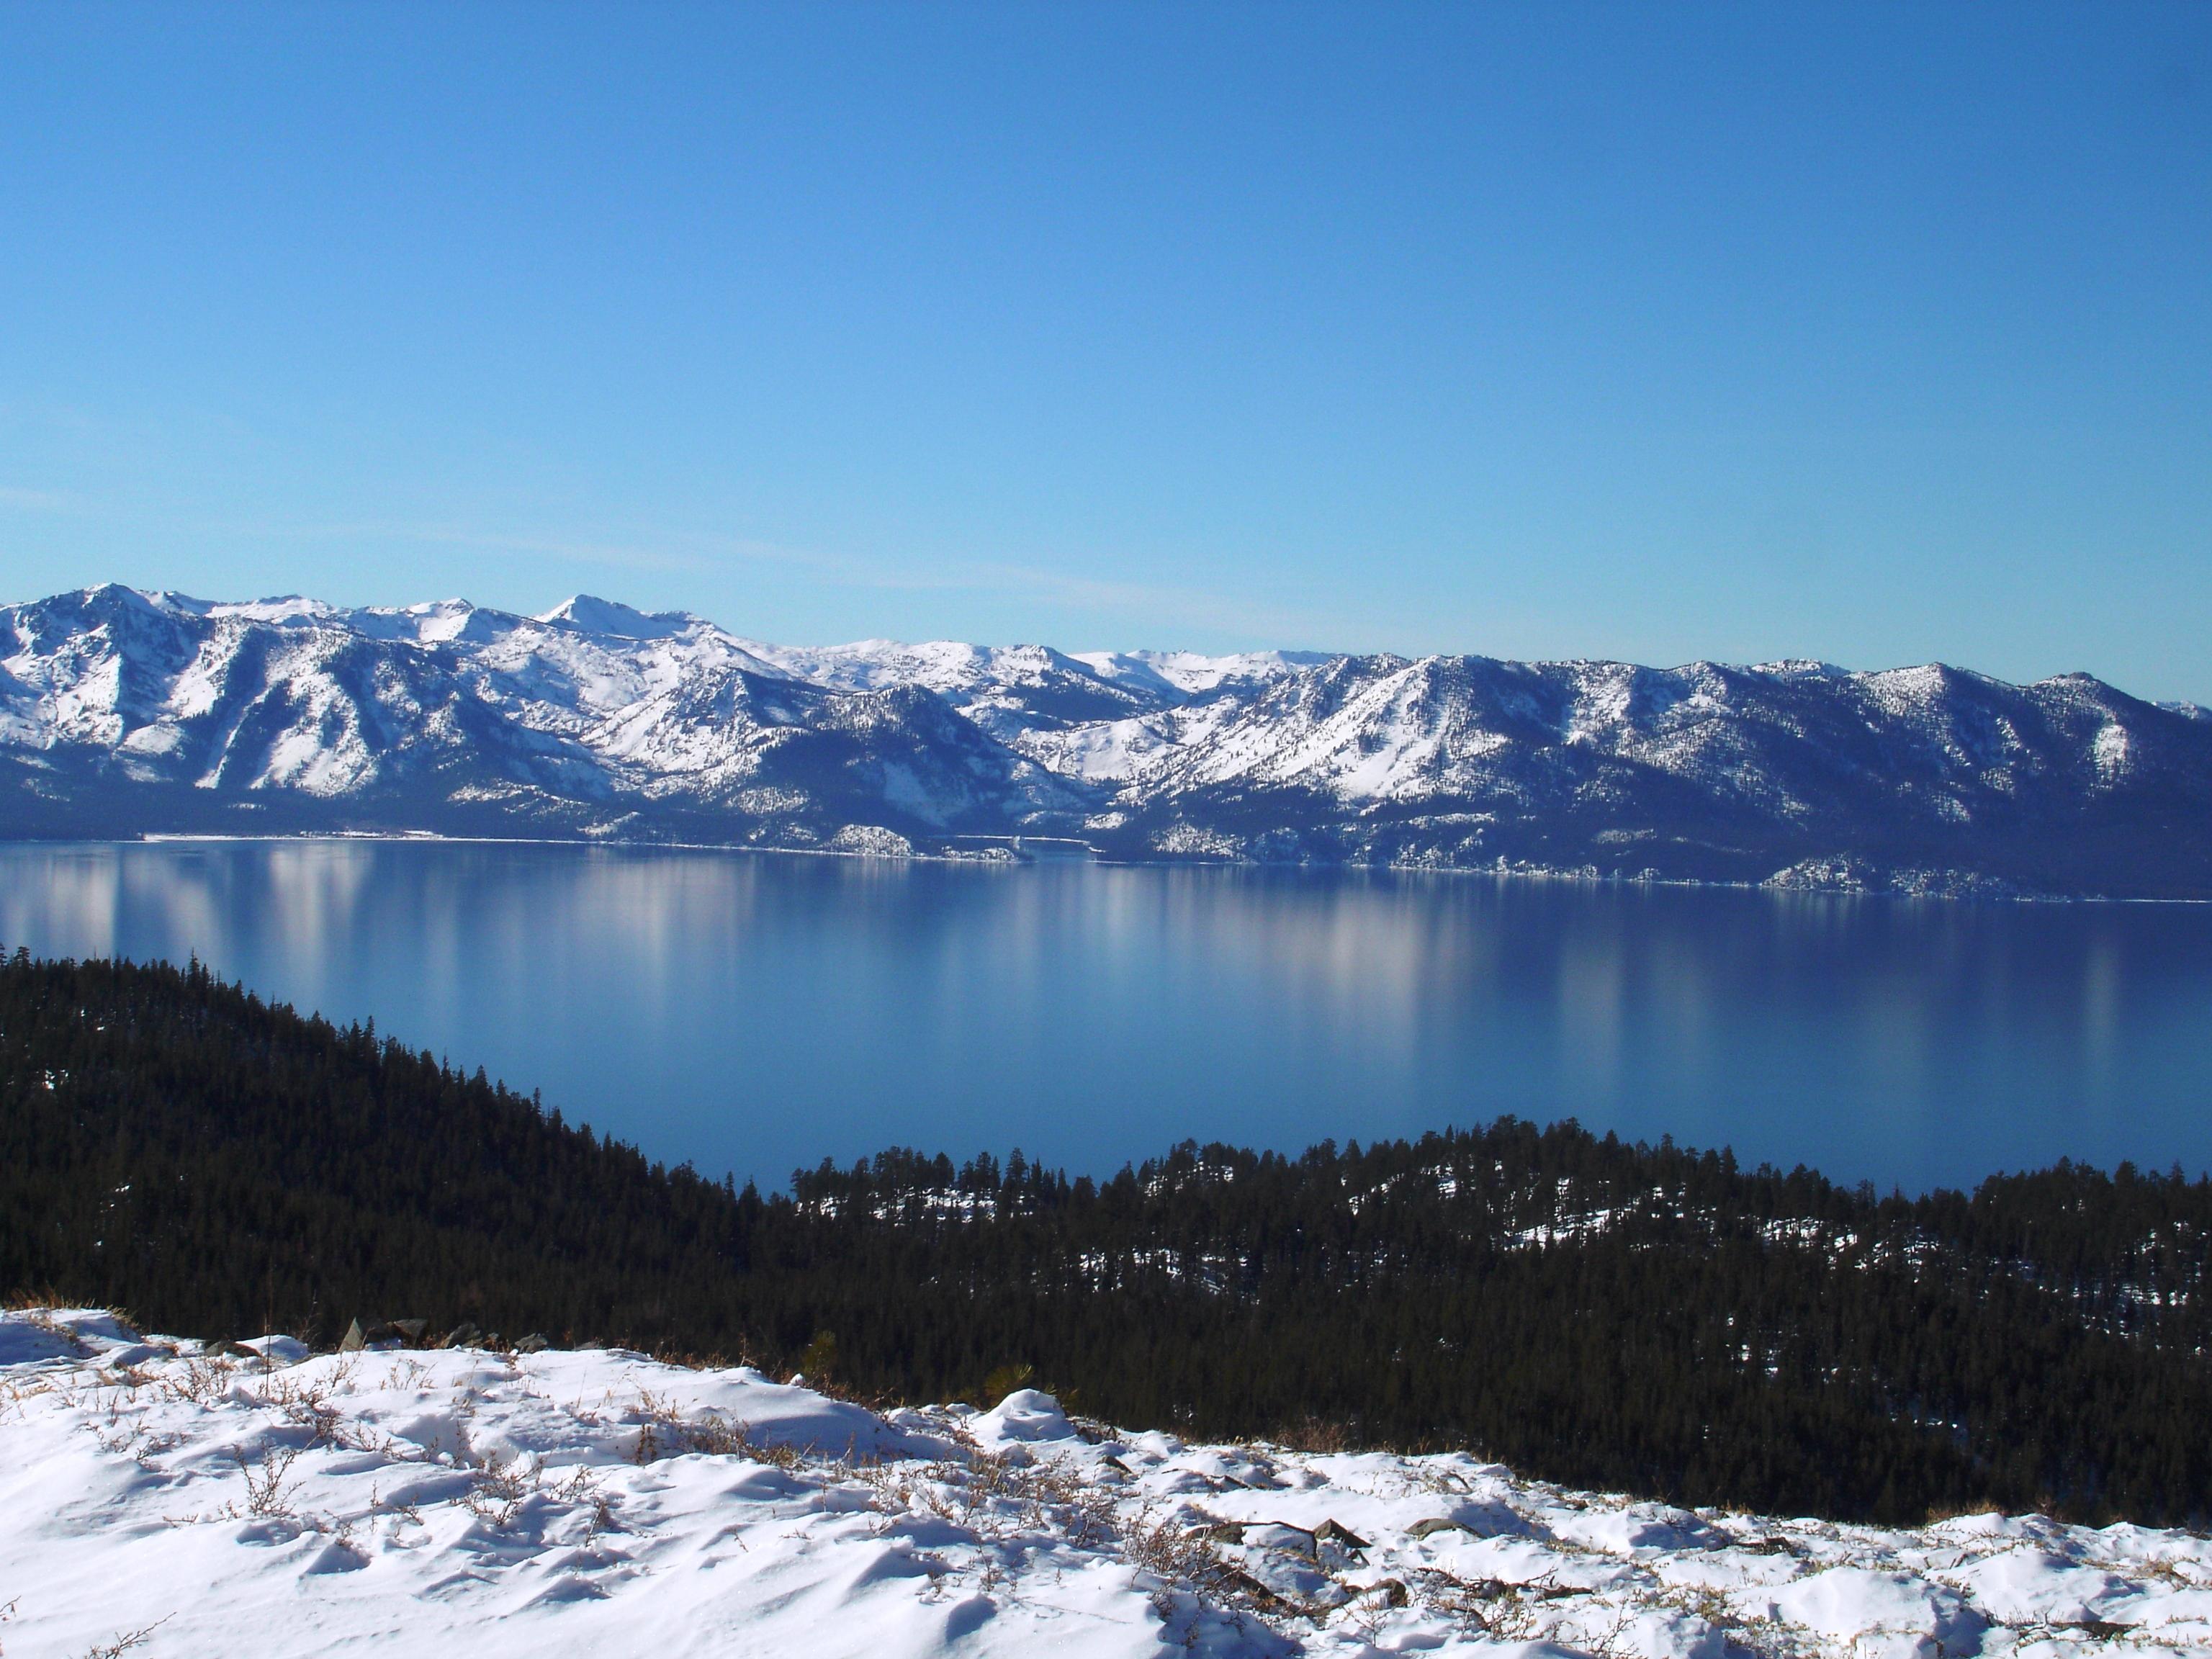 Lake Tahoe - Absolutely Breathtaking